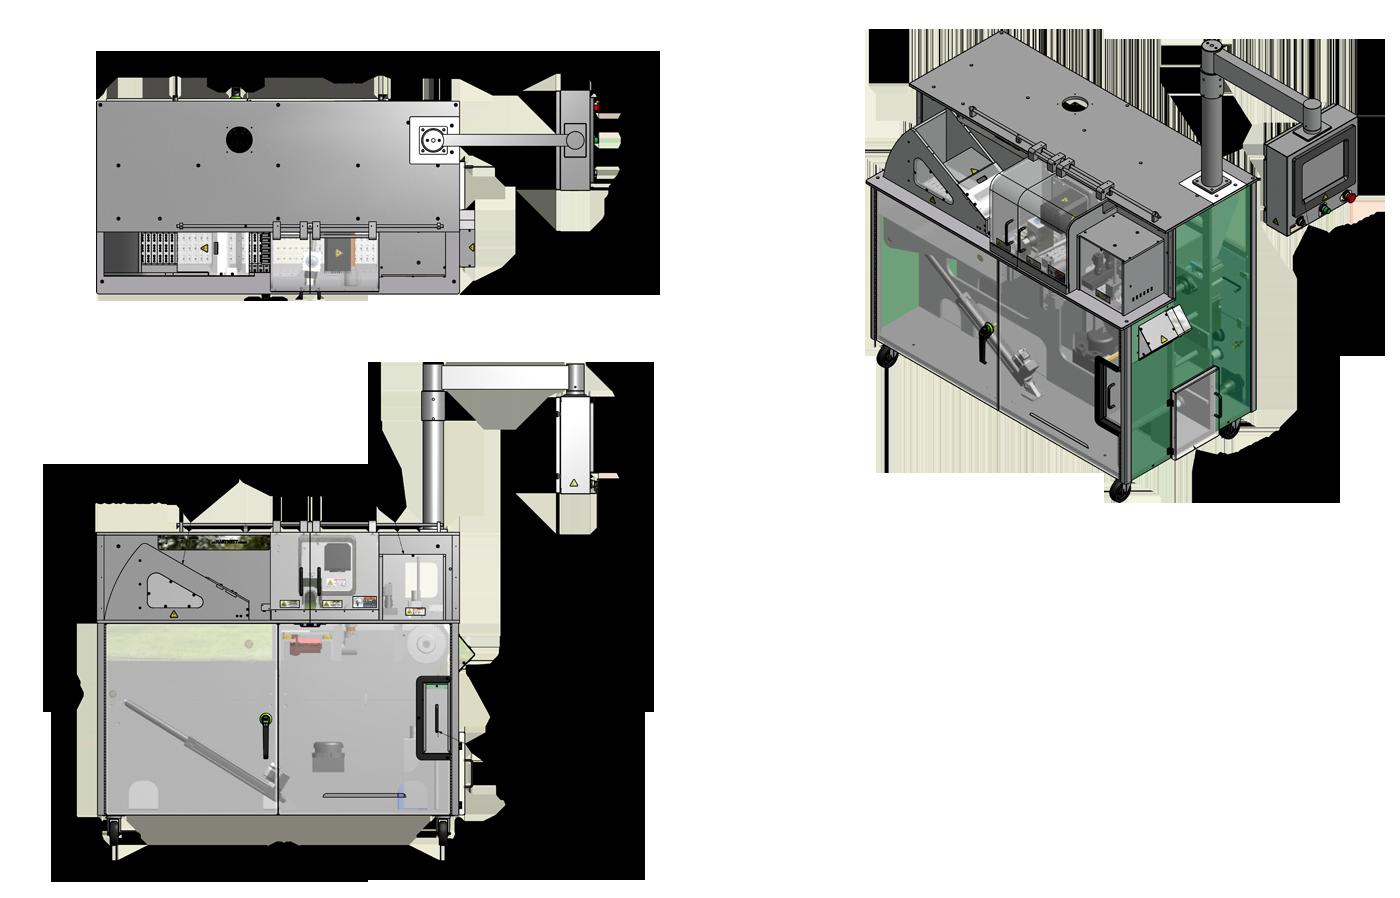 H-Track Laser Writer Machine - RW Hartnett Company